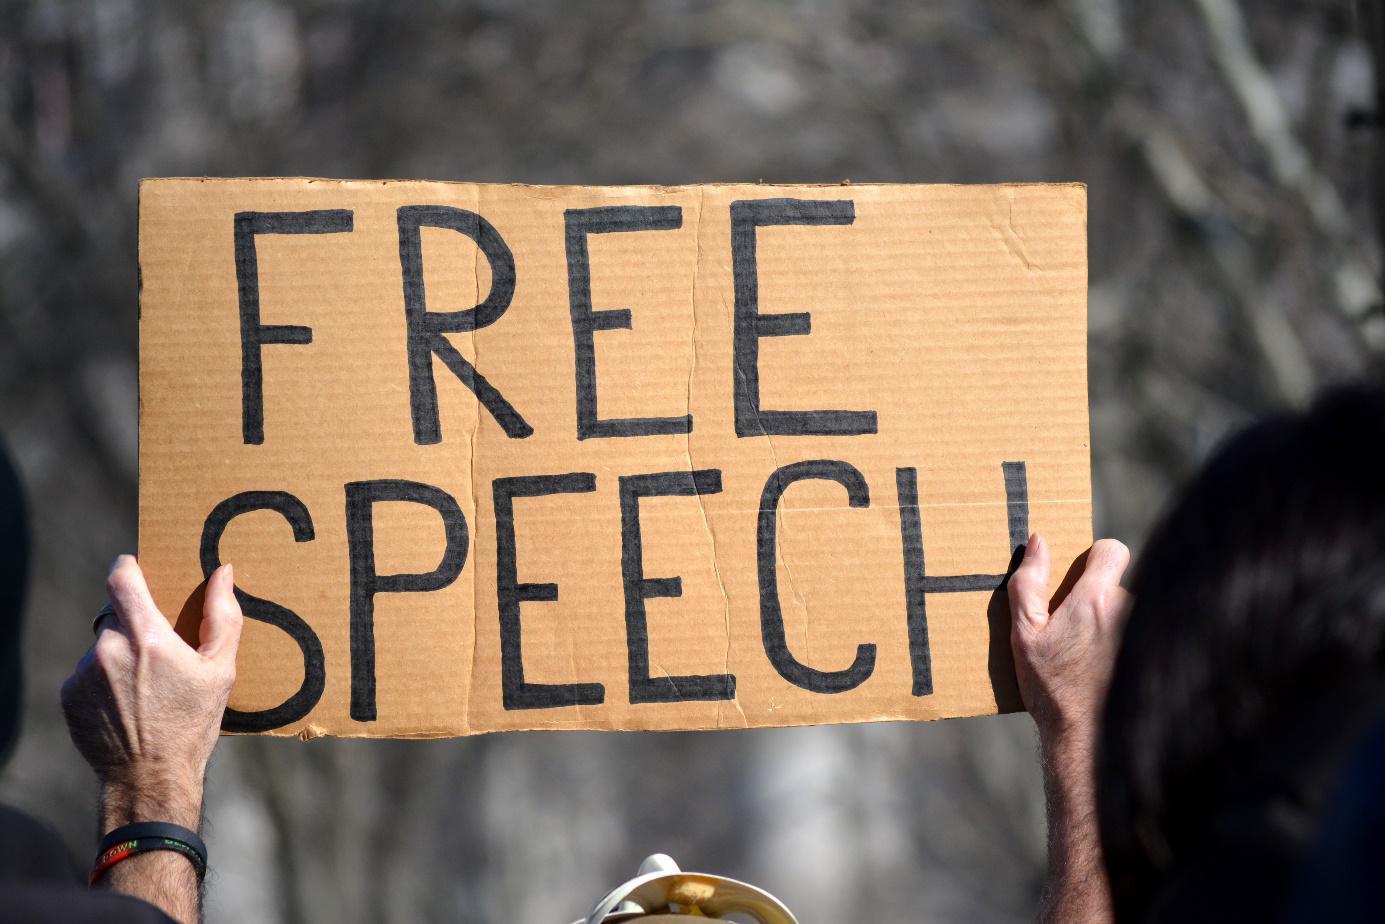 Zákonné právo versus morální povinnost:Rozbor protikladných paradigmat svobody projevu